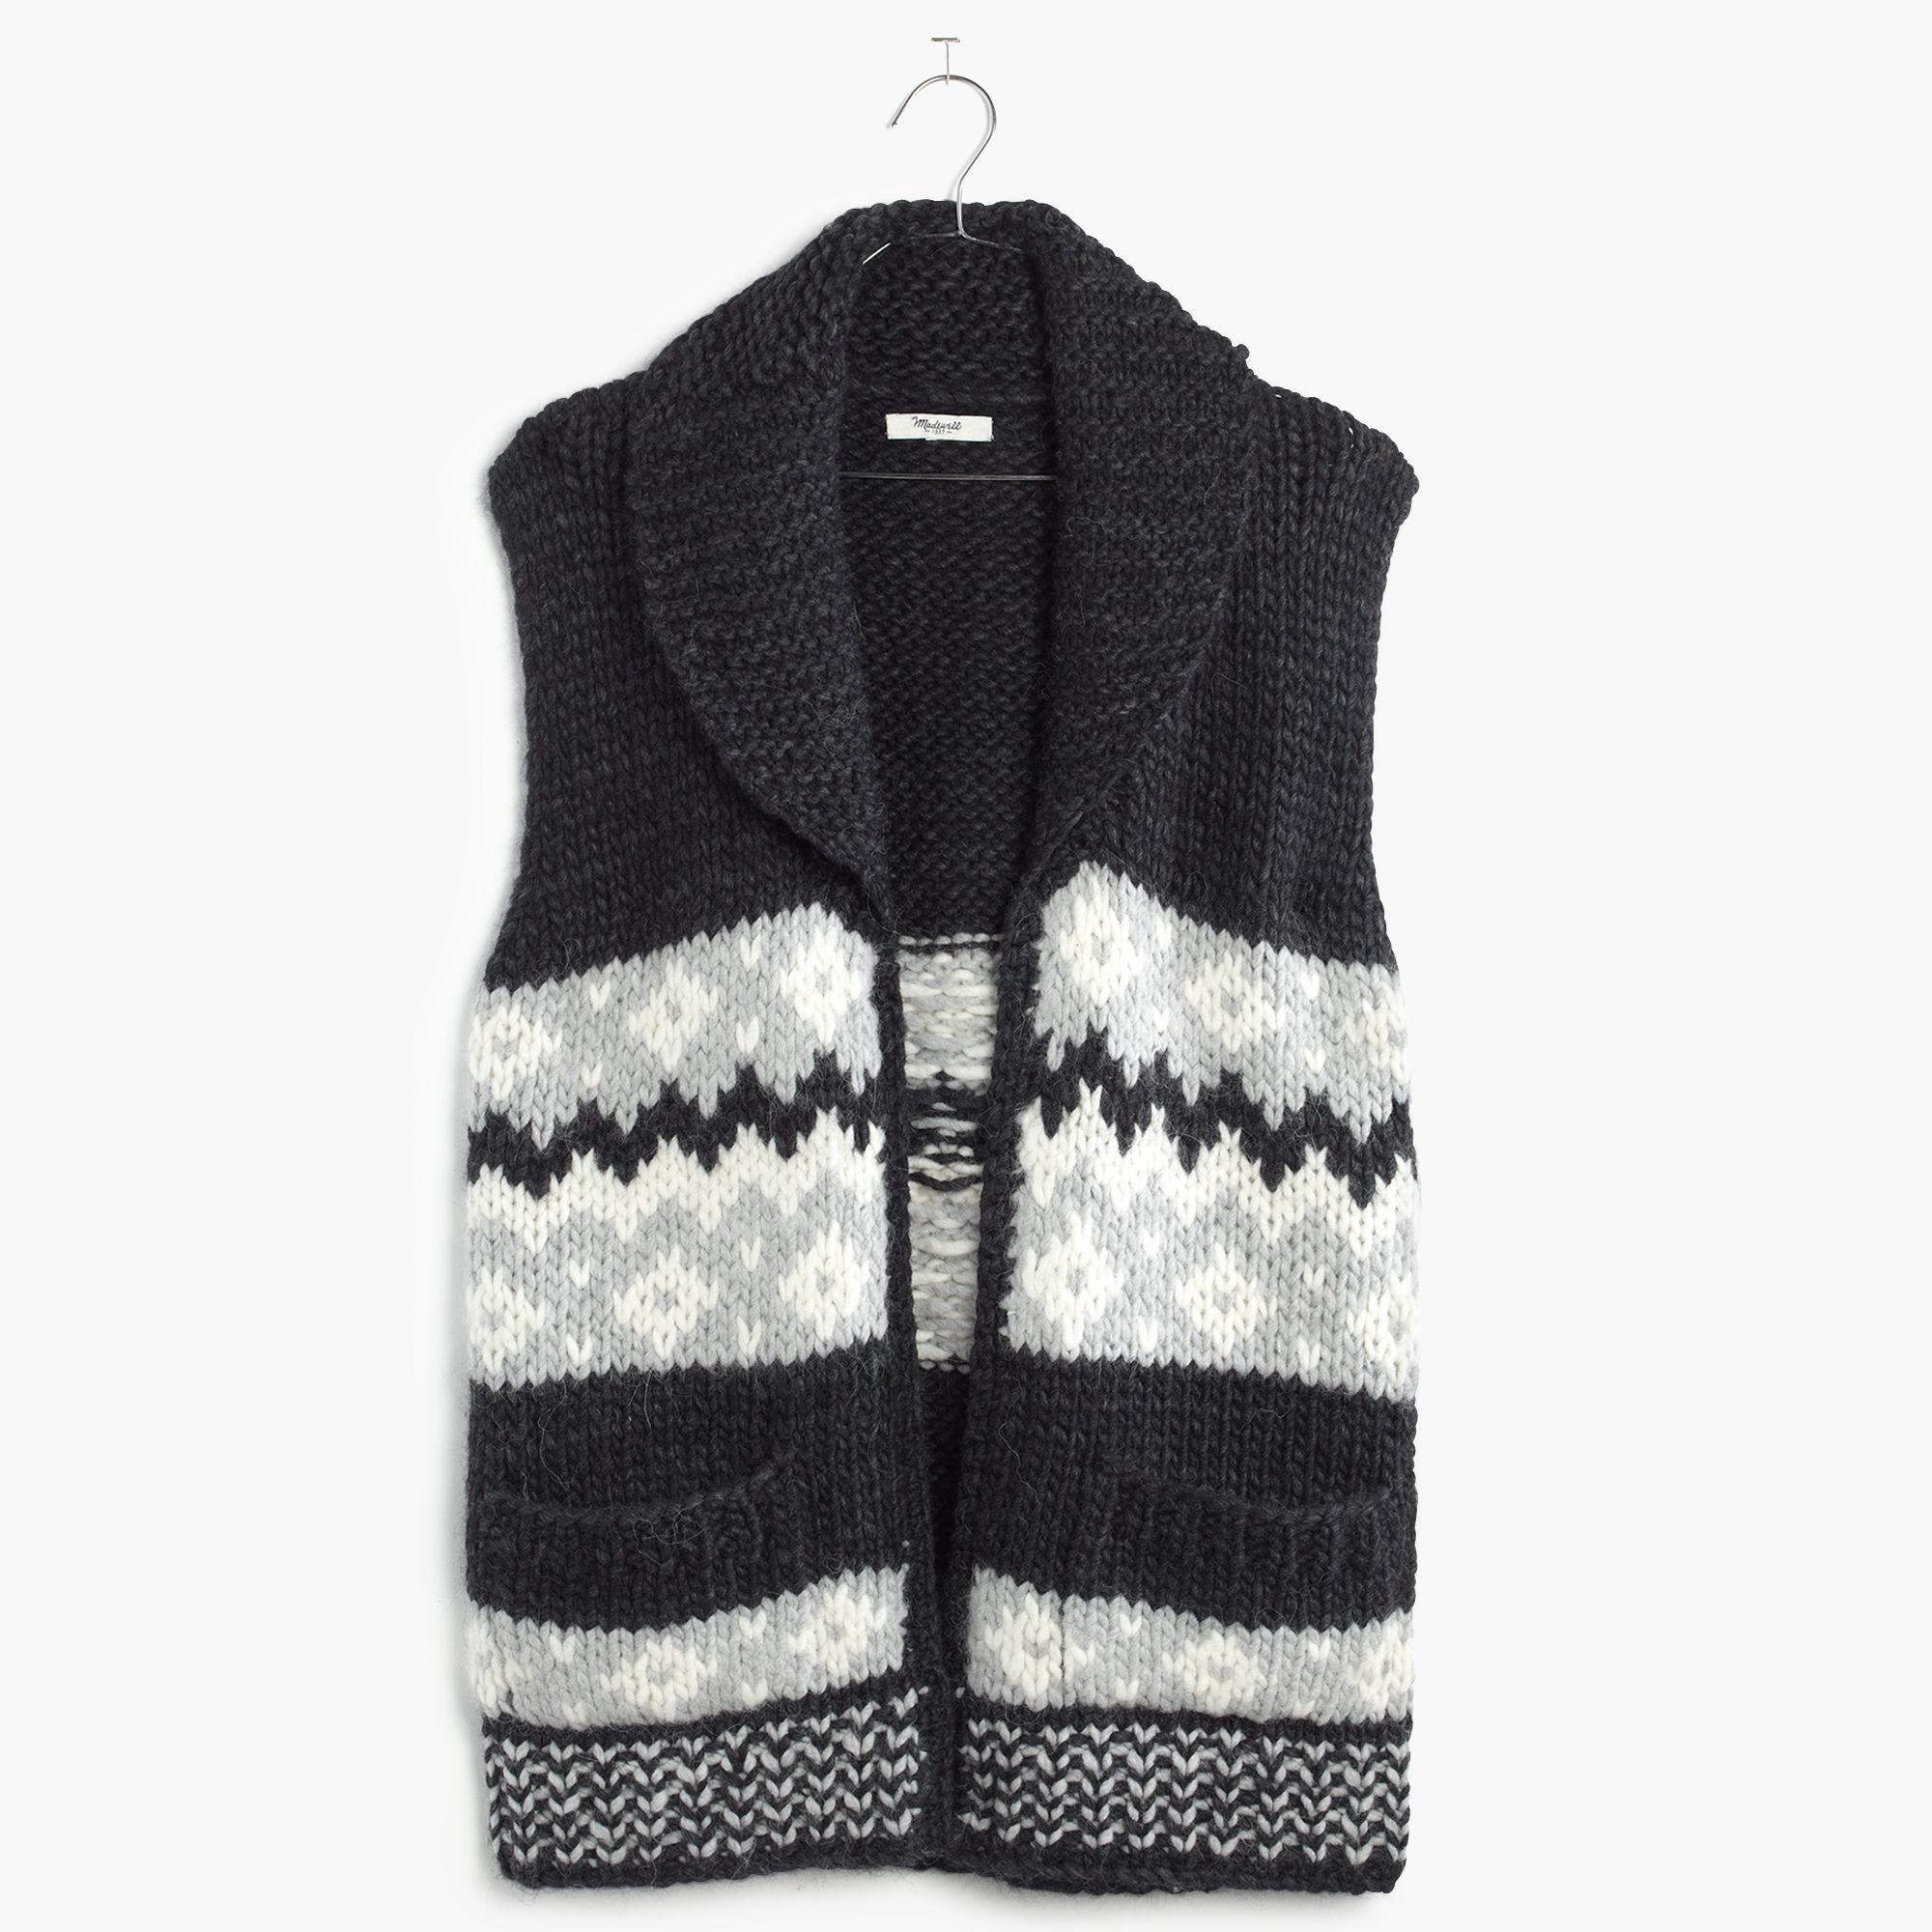 Madewell Handknit Fair Isle Sweater-vest in Black | Lyst